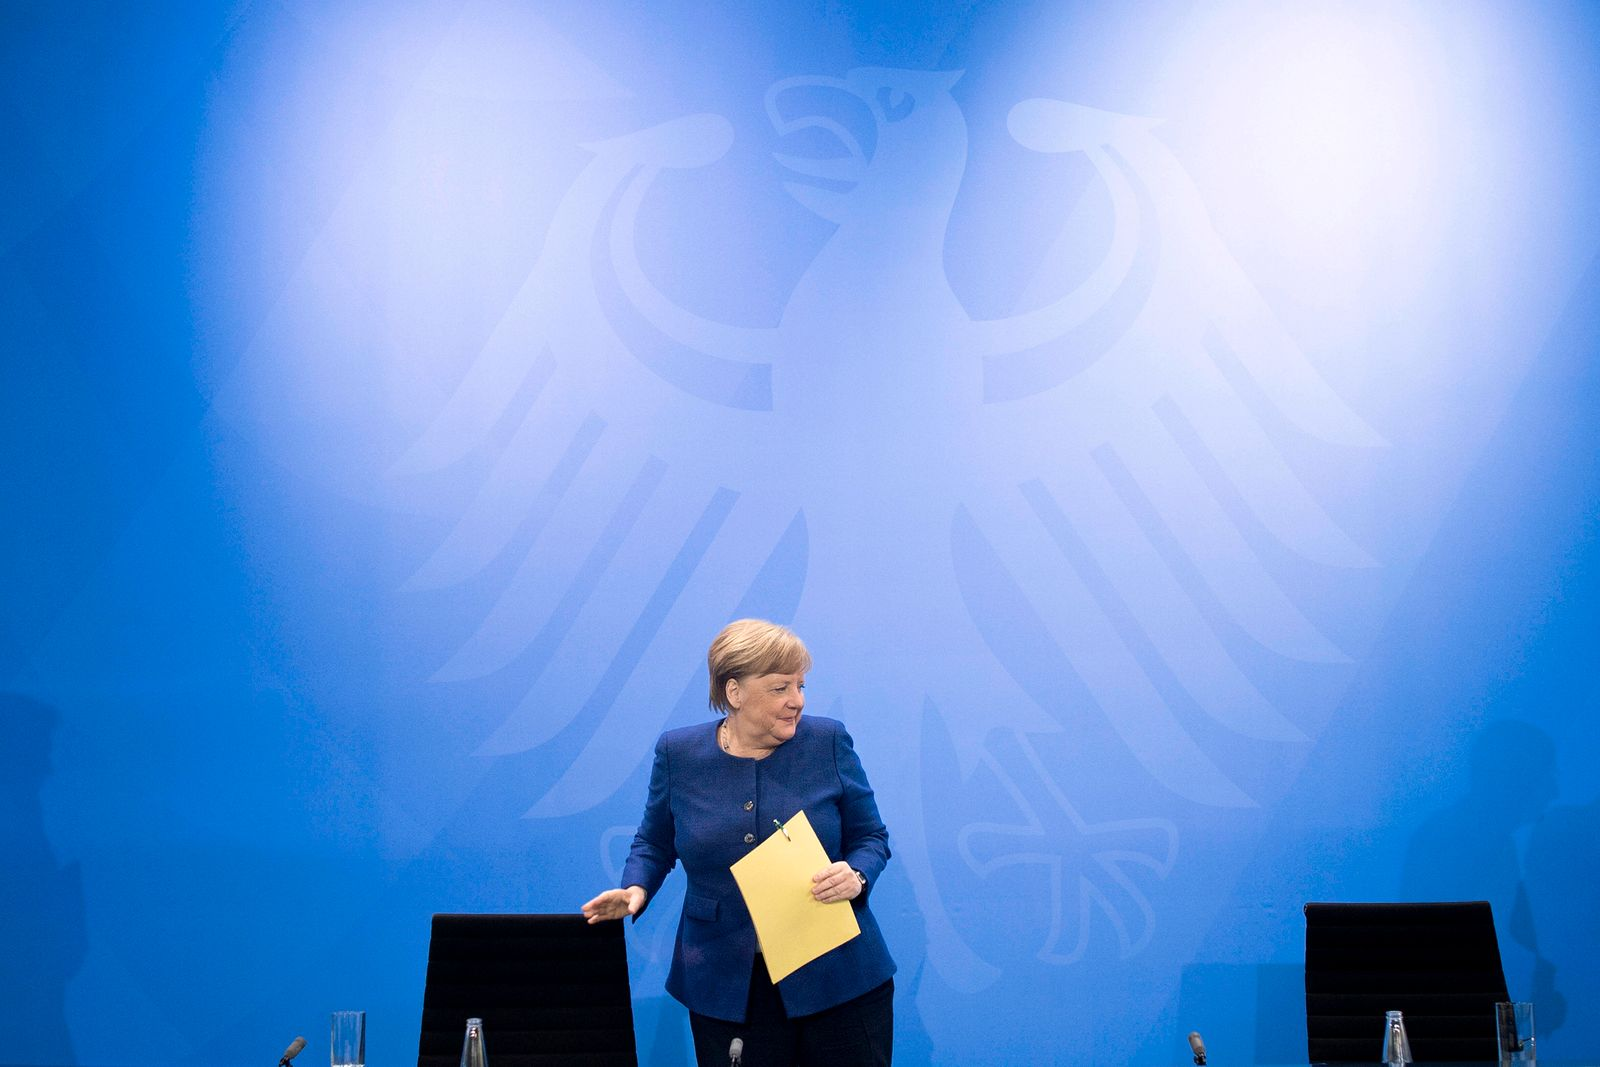 Angela Merkel, Press Call Coronavirus Crisis DEU, Deutschland, Germany, Berlin, 30.04.2020 Bundeskanzlerin Angela Merkel